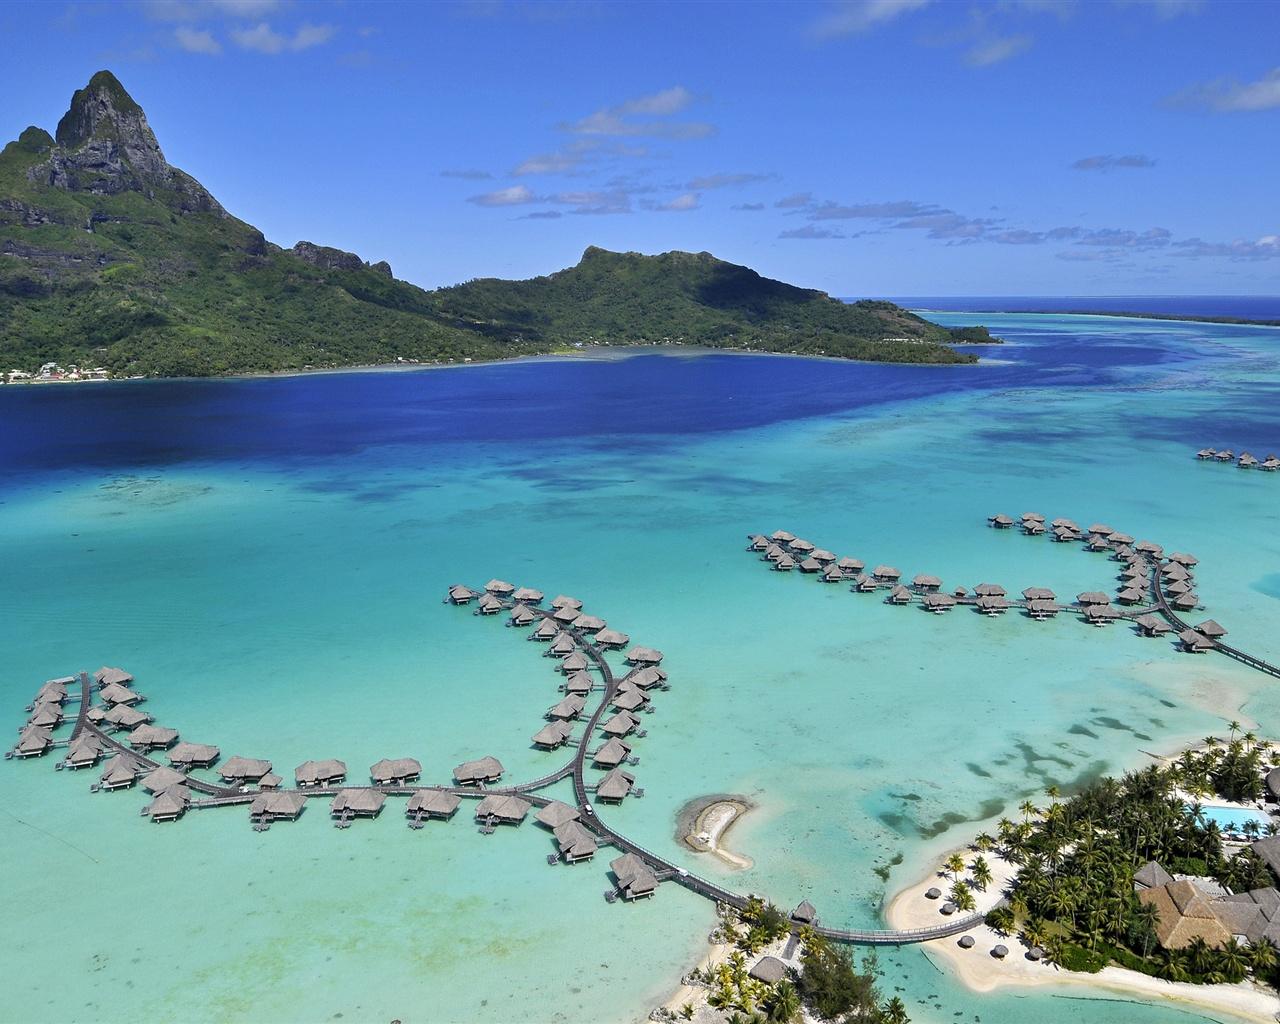 Bora Bora Island sea beach houses 1280x1024jpg 1280x1024